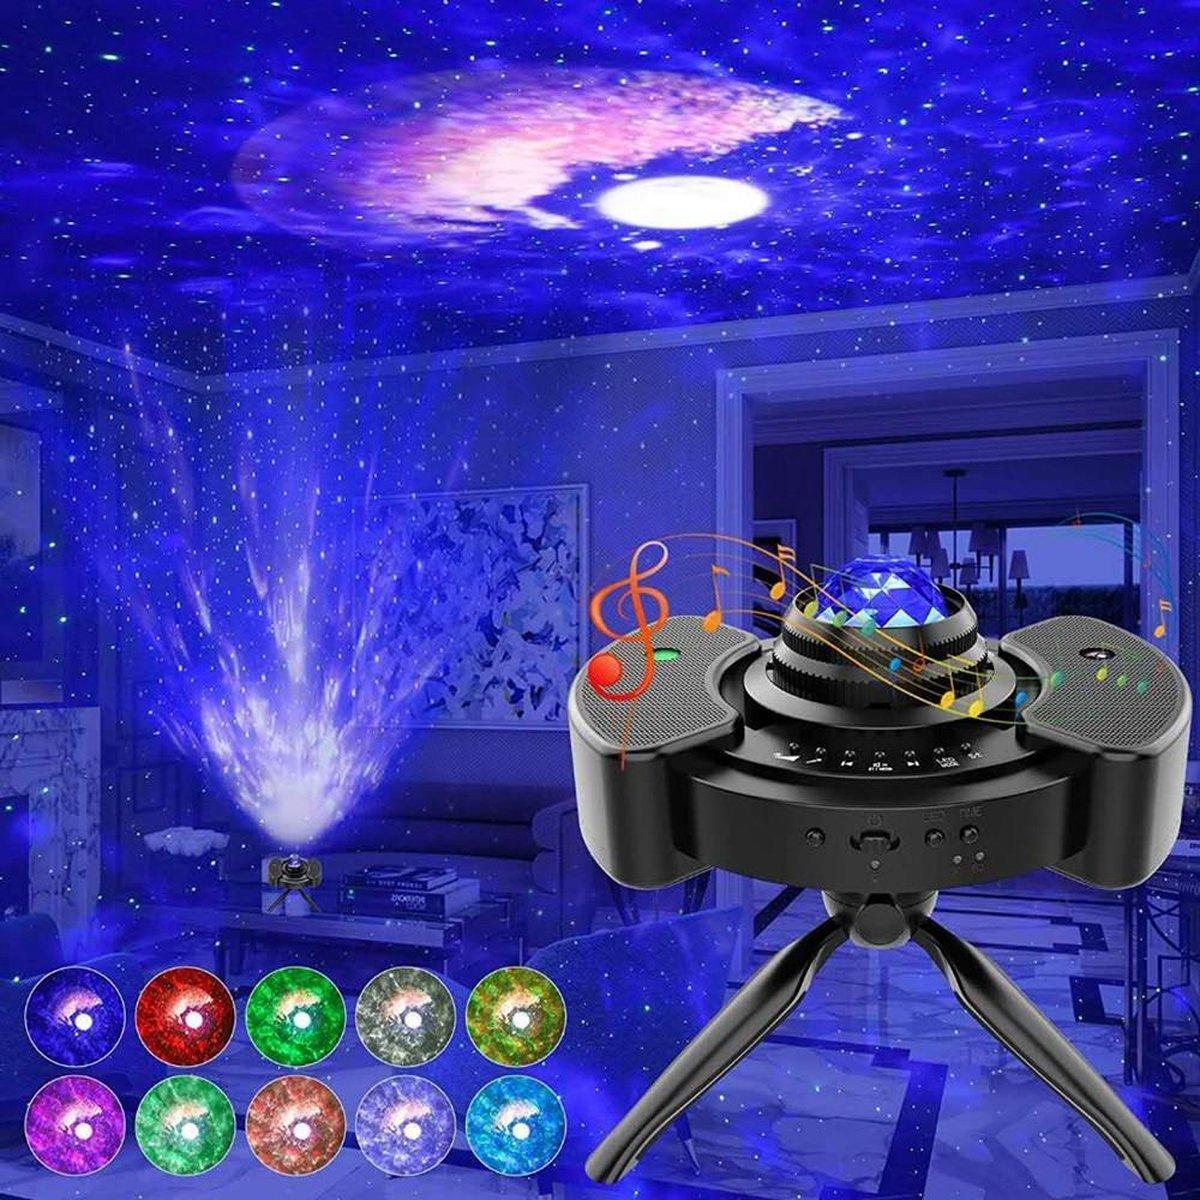 B-care Sterren Projector 2.0 - Vernieuwd 2021 Model - 360° Roterende Lamp - Bluetooth - Sterrenhemel - Sterrenlamp - Galaxy Projector - Stars - Smart Laser - Mediteren - Afterparty - Spacelamp